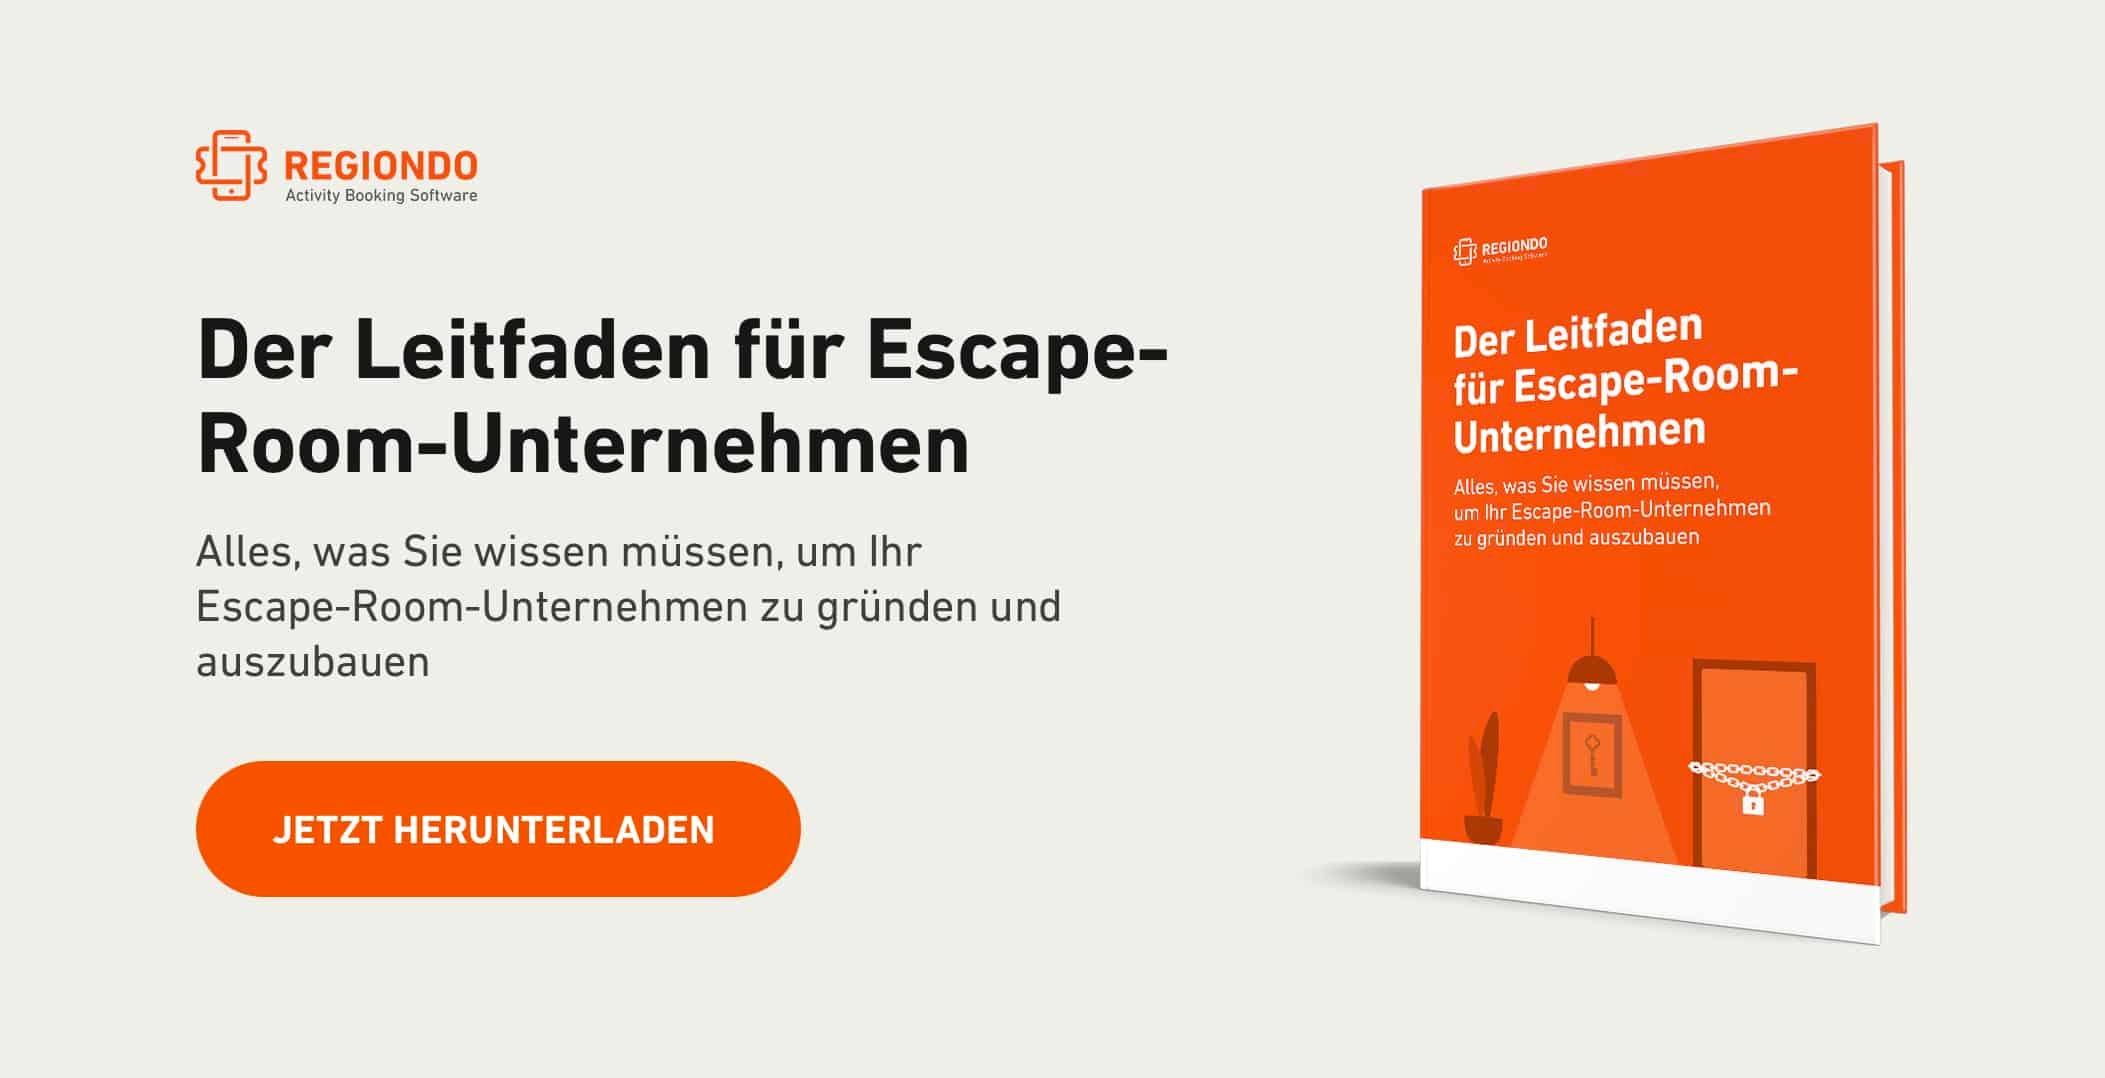 Escape-Room-Unternehmen gründen